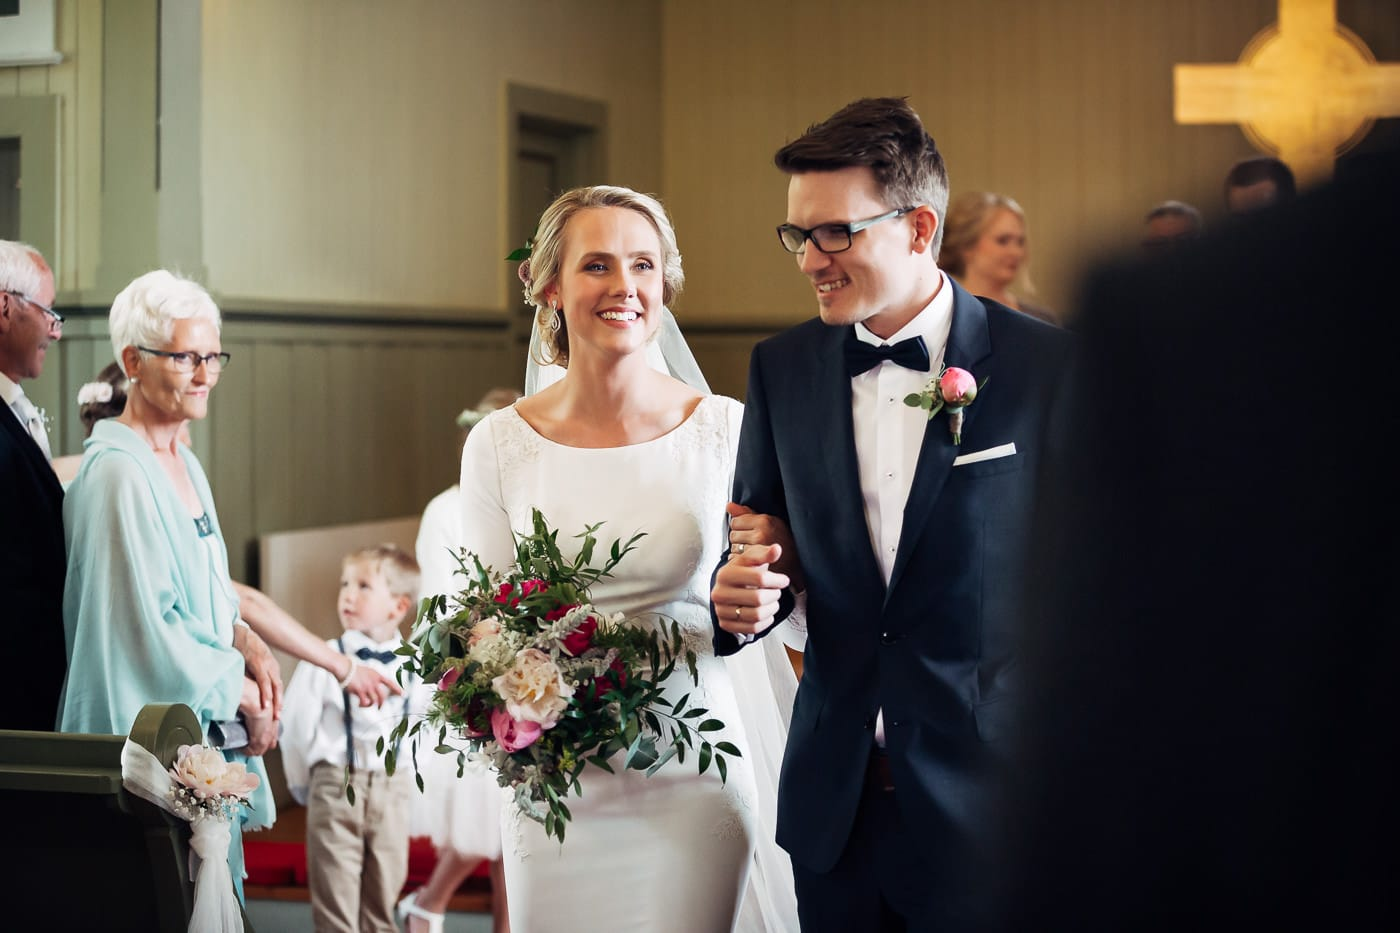 Karoline & Andreas - bryllup i Østfold med magiske detaljer Bryllup Fredrikstad Fotograf 28